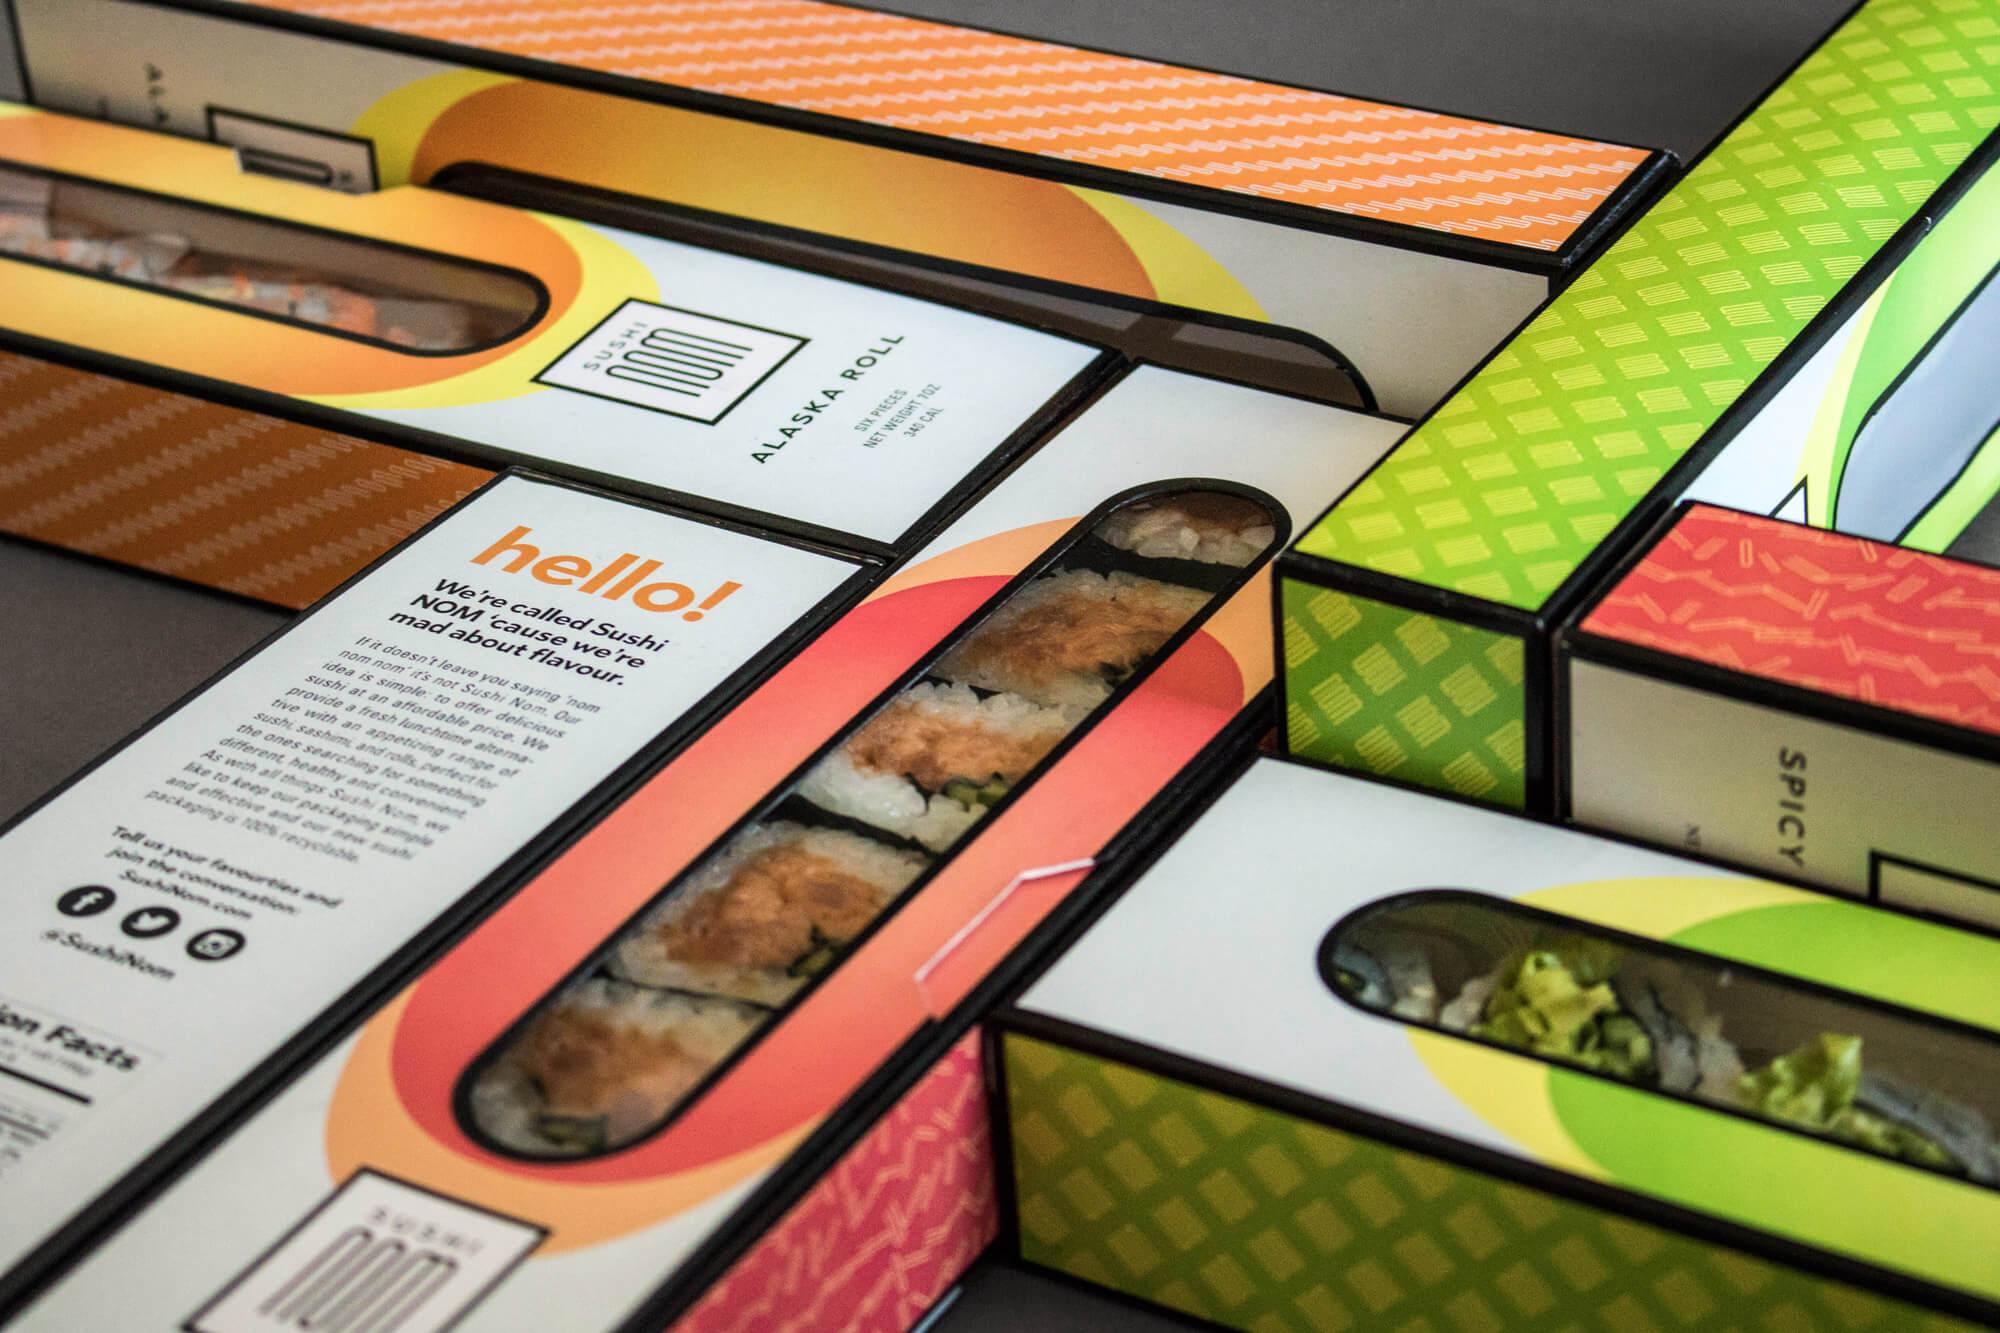 kevin-kwok-design-sushi-nom-5